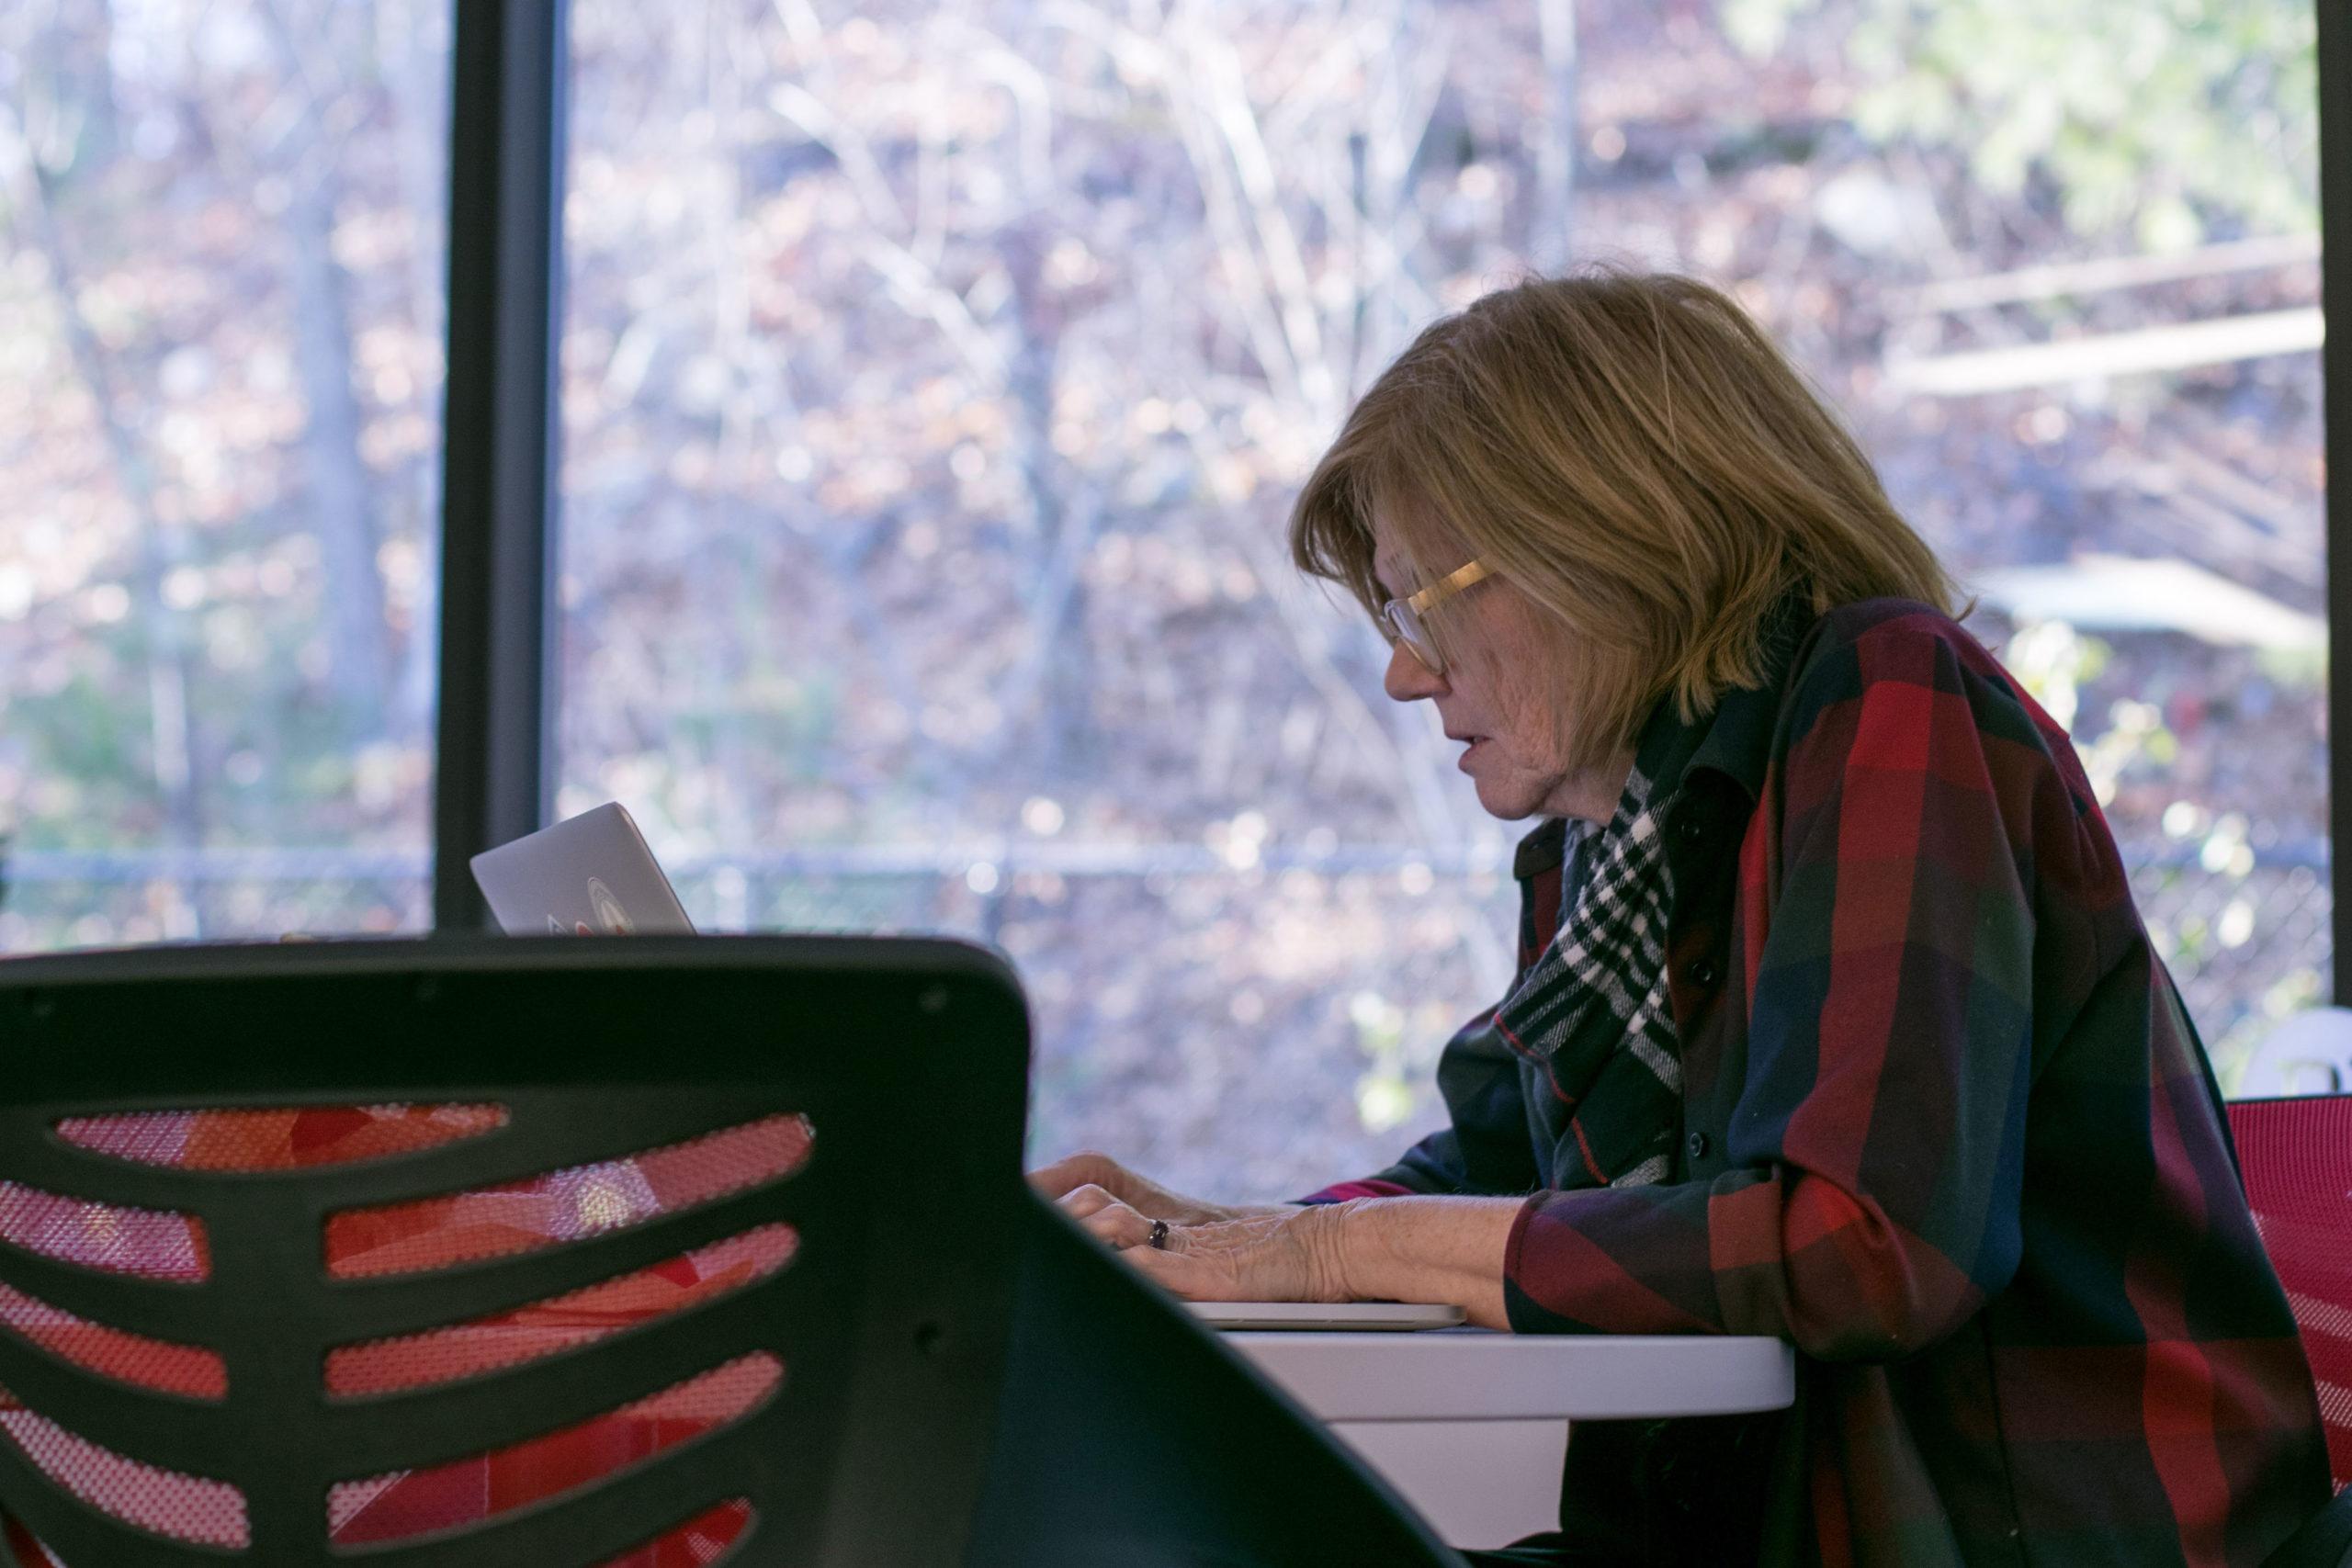 self-aware woman at work